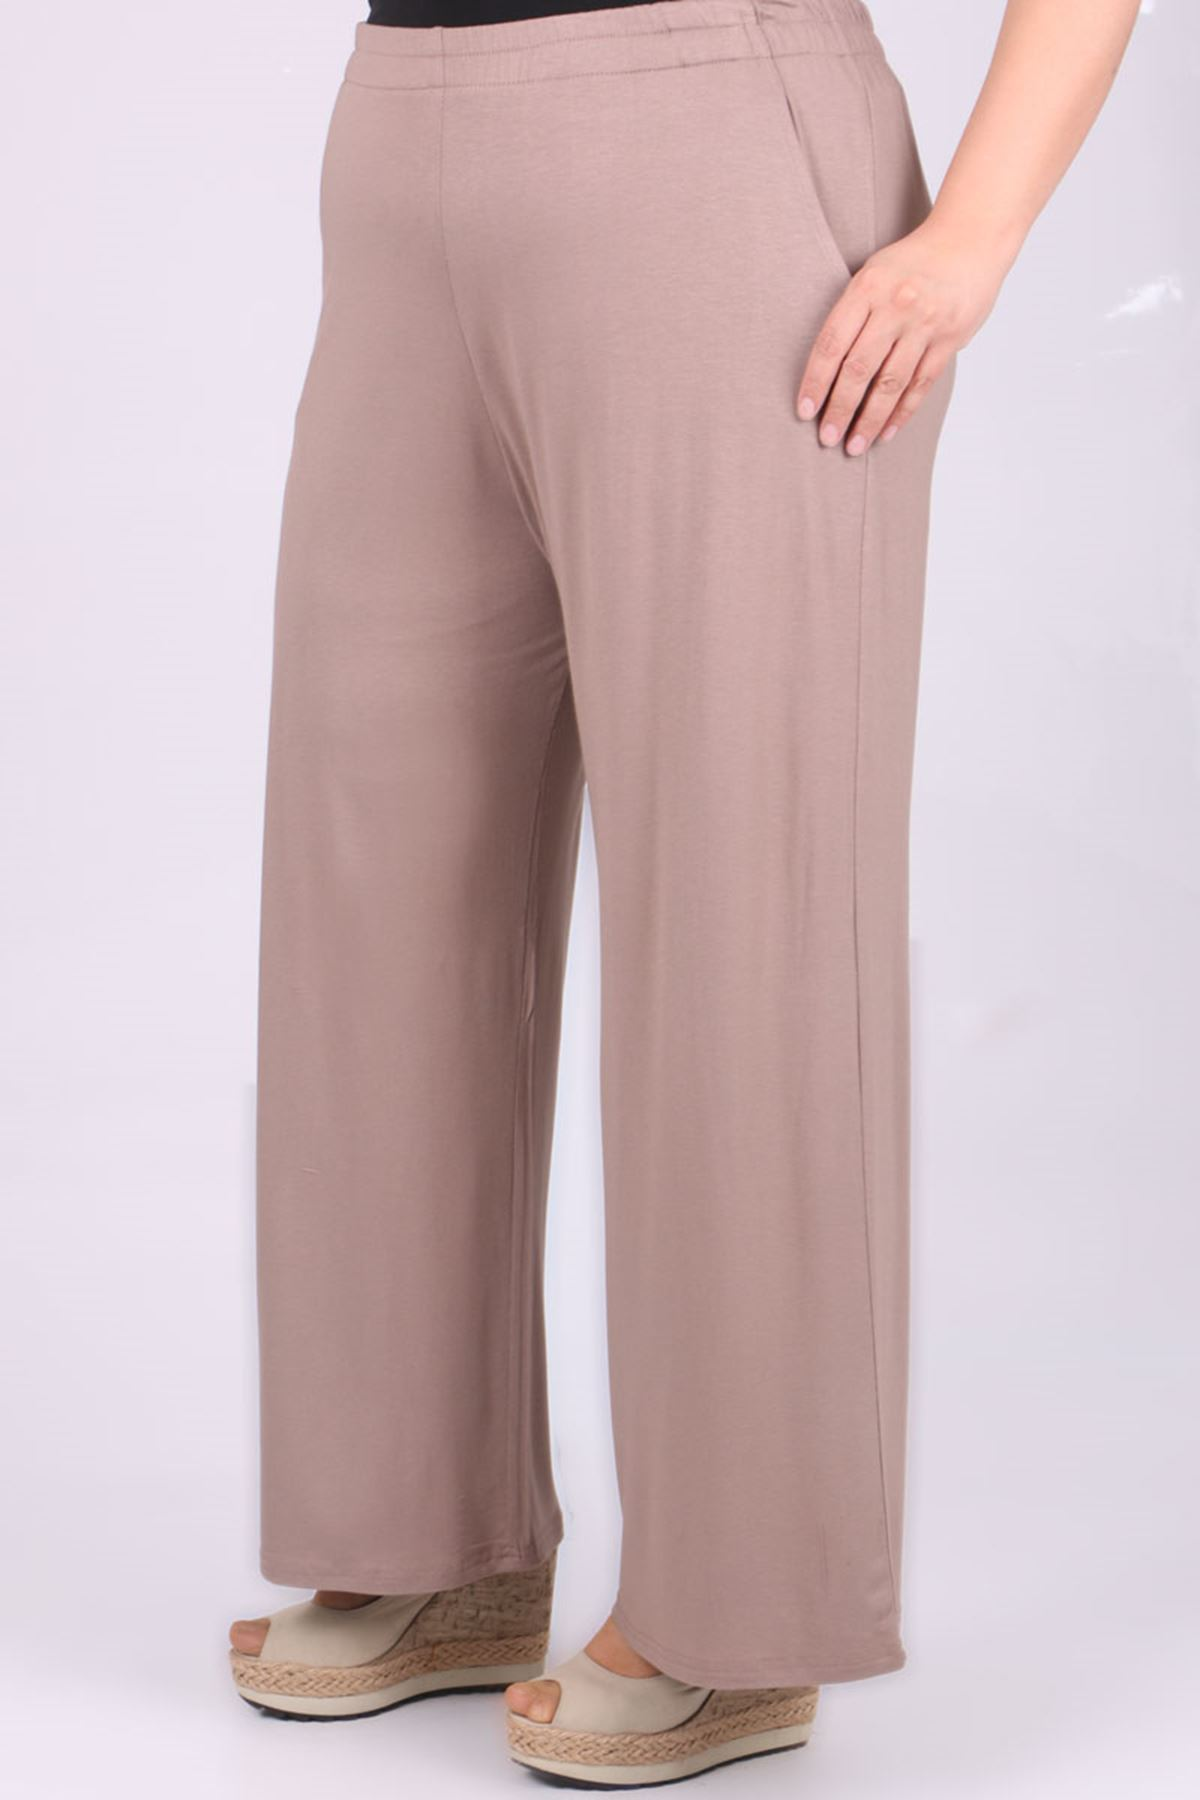 9012 Plus Size Elastic Waist Pants - Mink